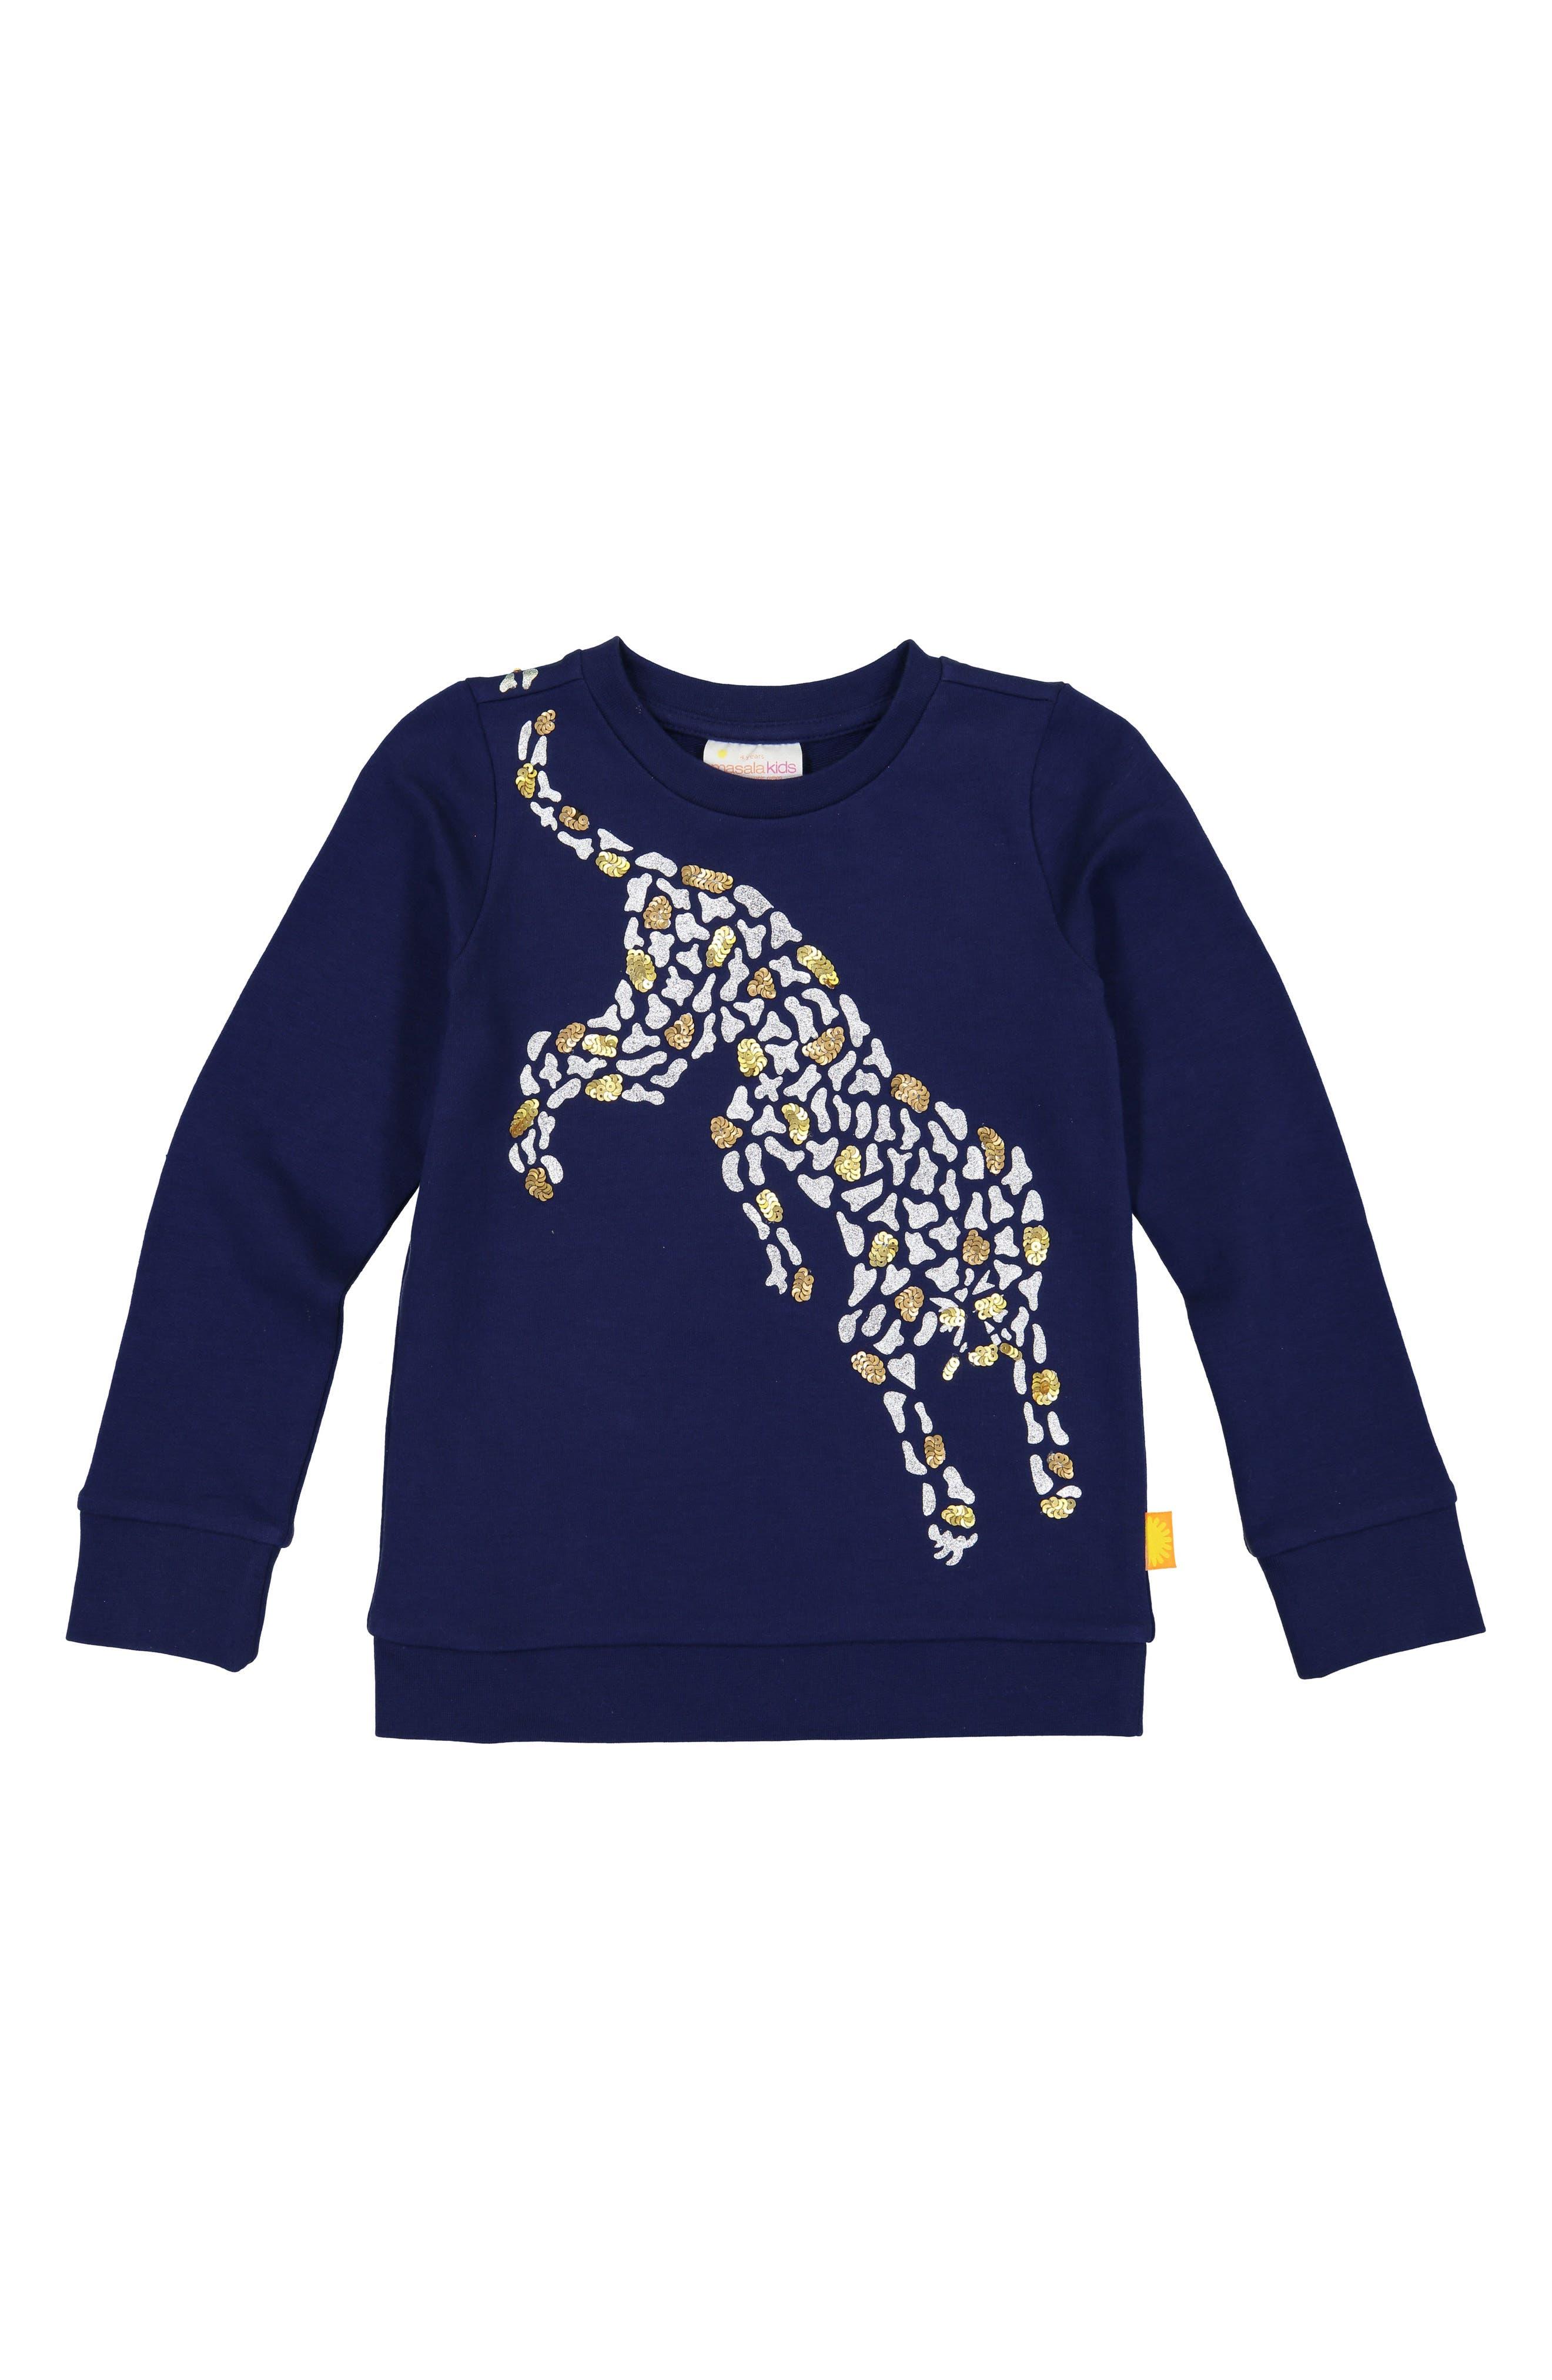 Cheetah Organic Cotton Sweatshirt,                         Main,                         color, NAVY